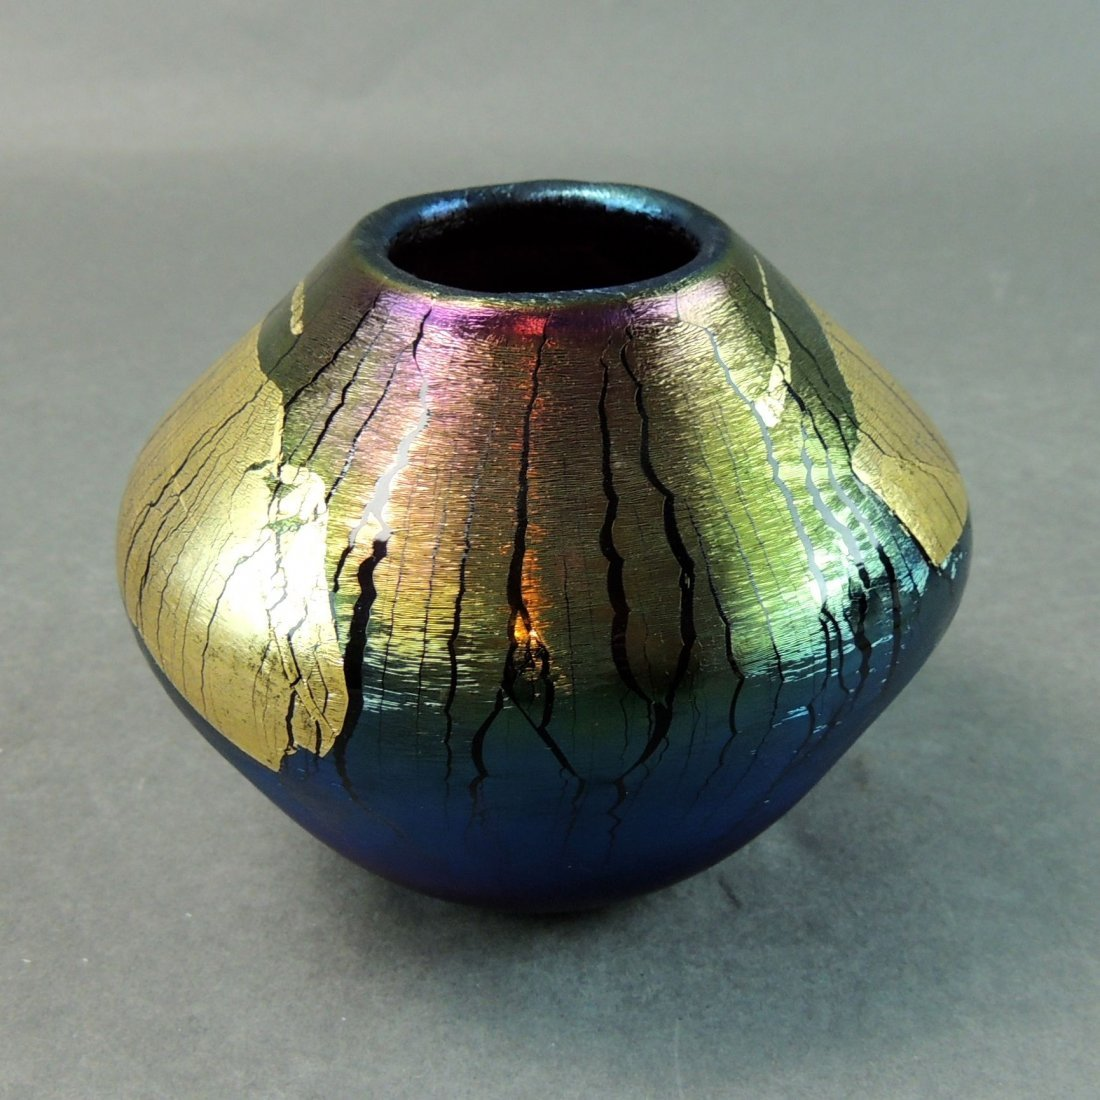 Robert Eickholt 1988 Iridescent Studio Art Glass Vase - 4